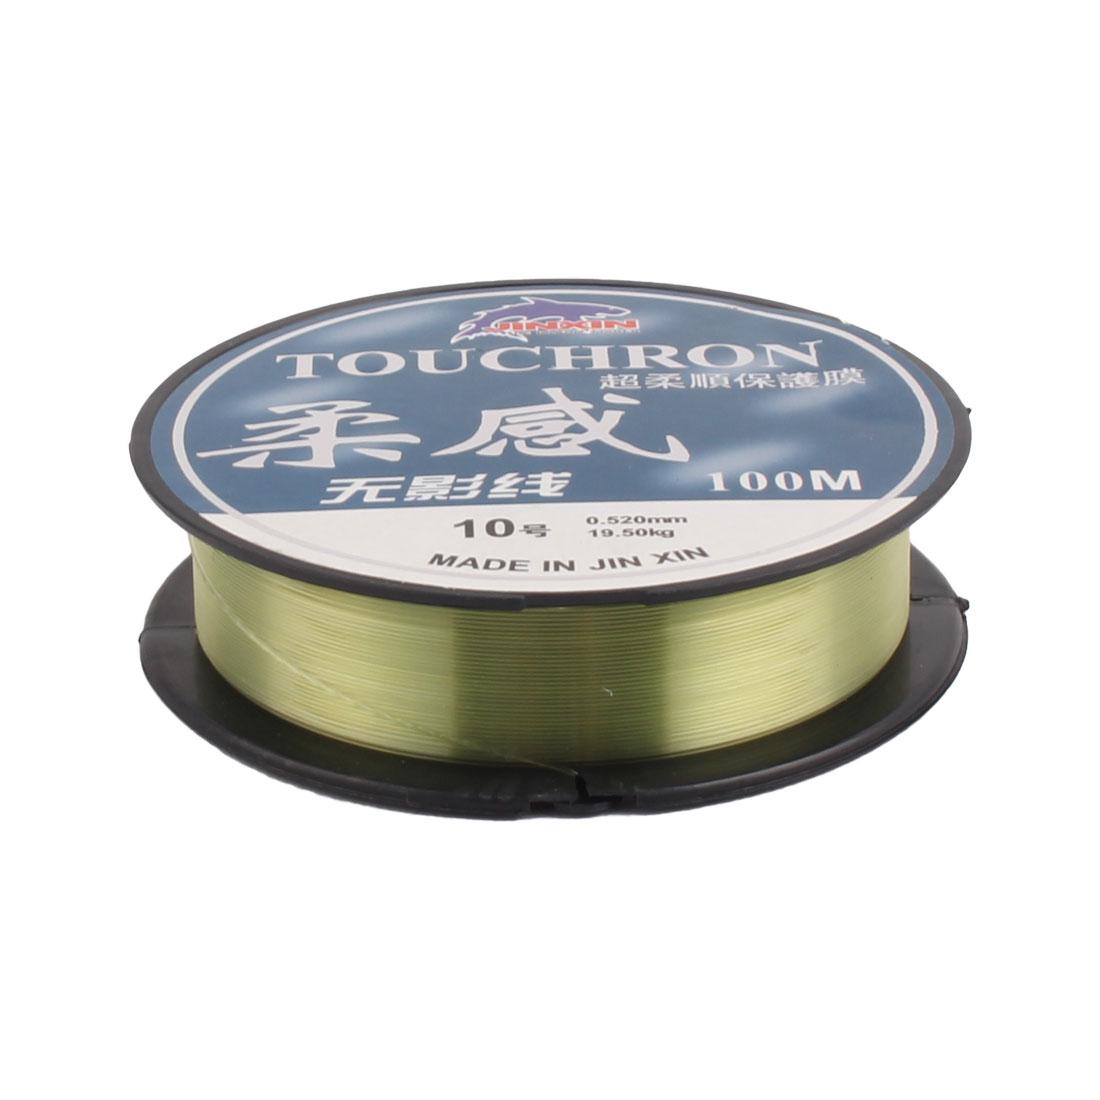 100M 19.5kg 0.52mm Diameter 10# Plastic Fishing Line Spool